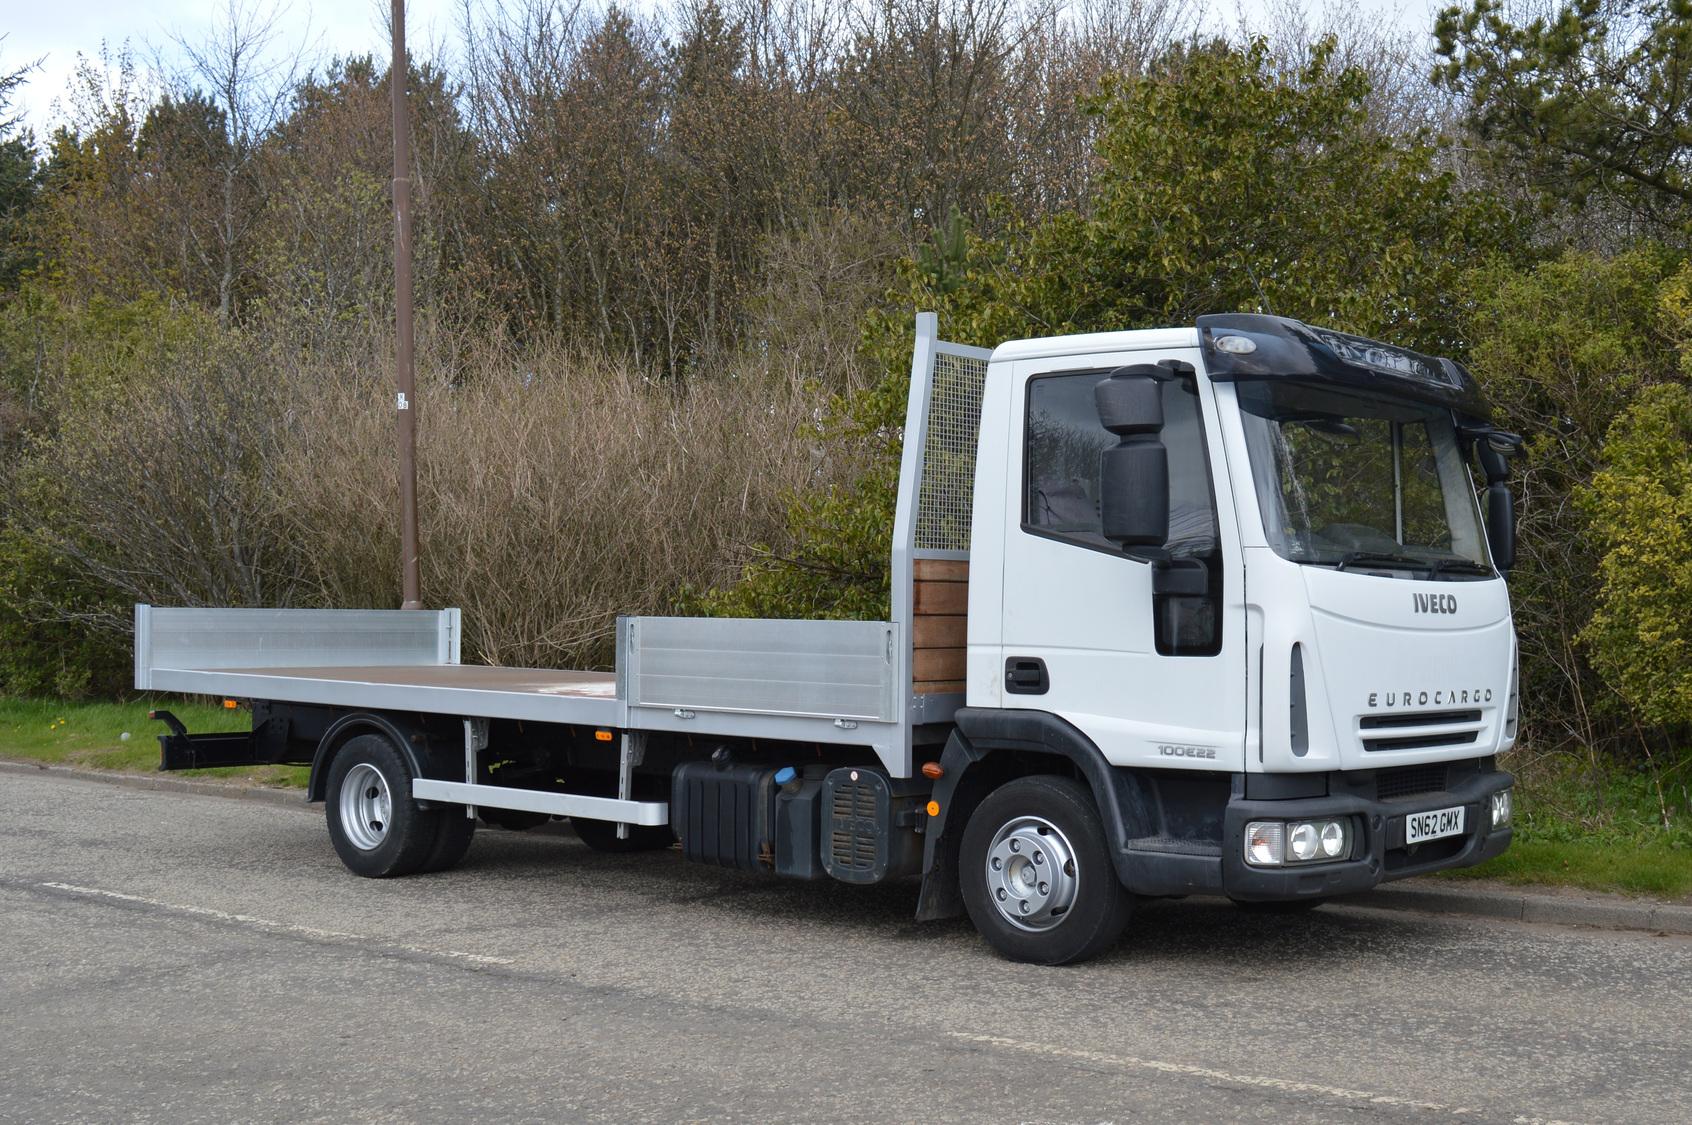 Iveco Trucks For Sale | MV Commercial